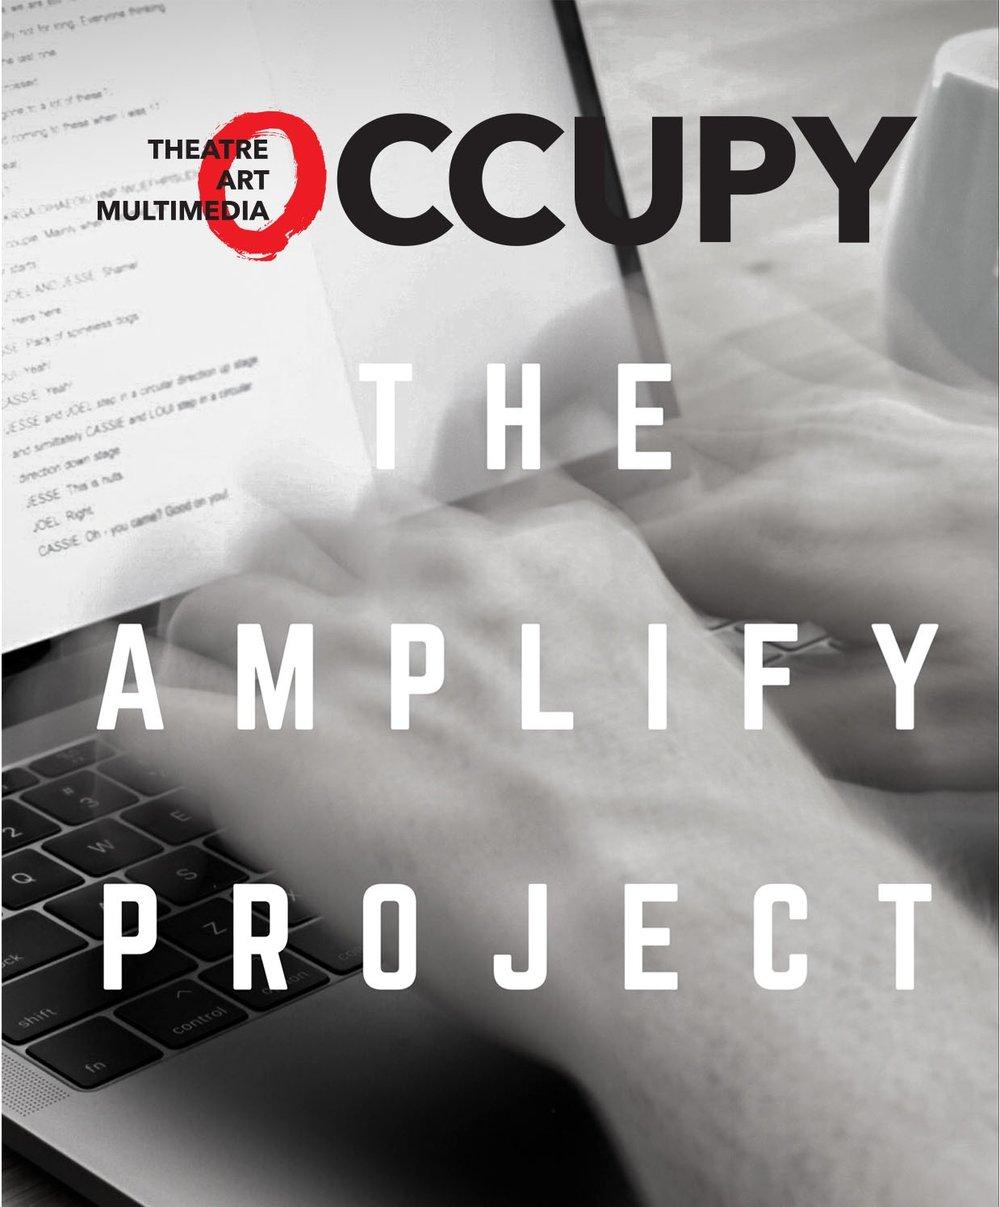 amplify+project+.jpg